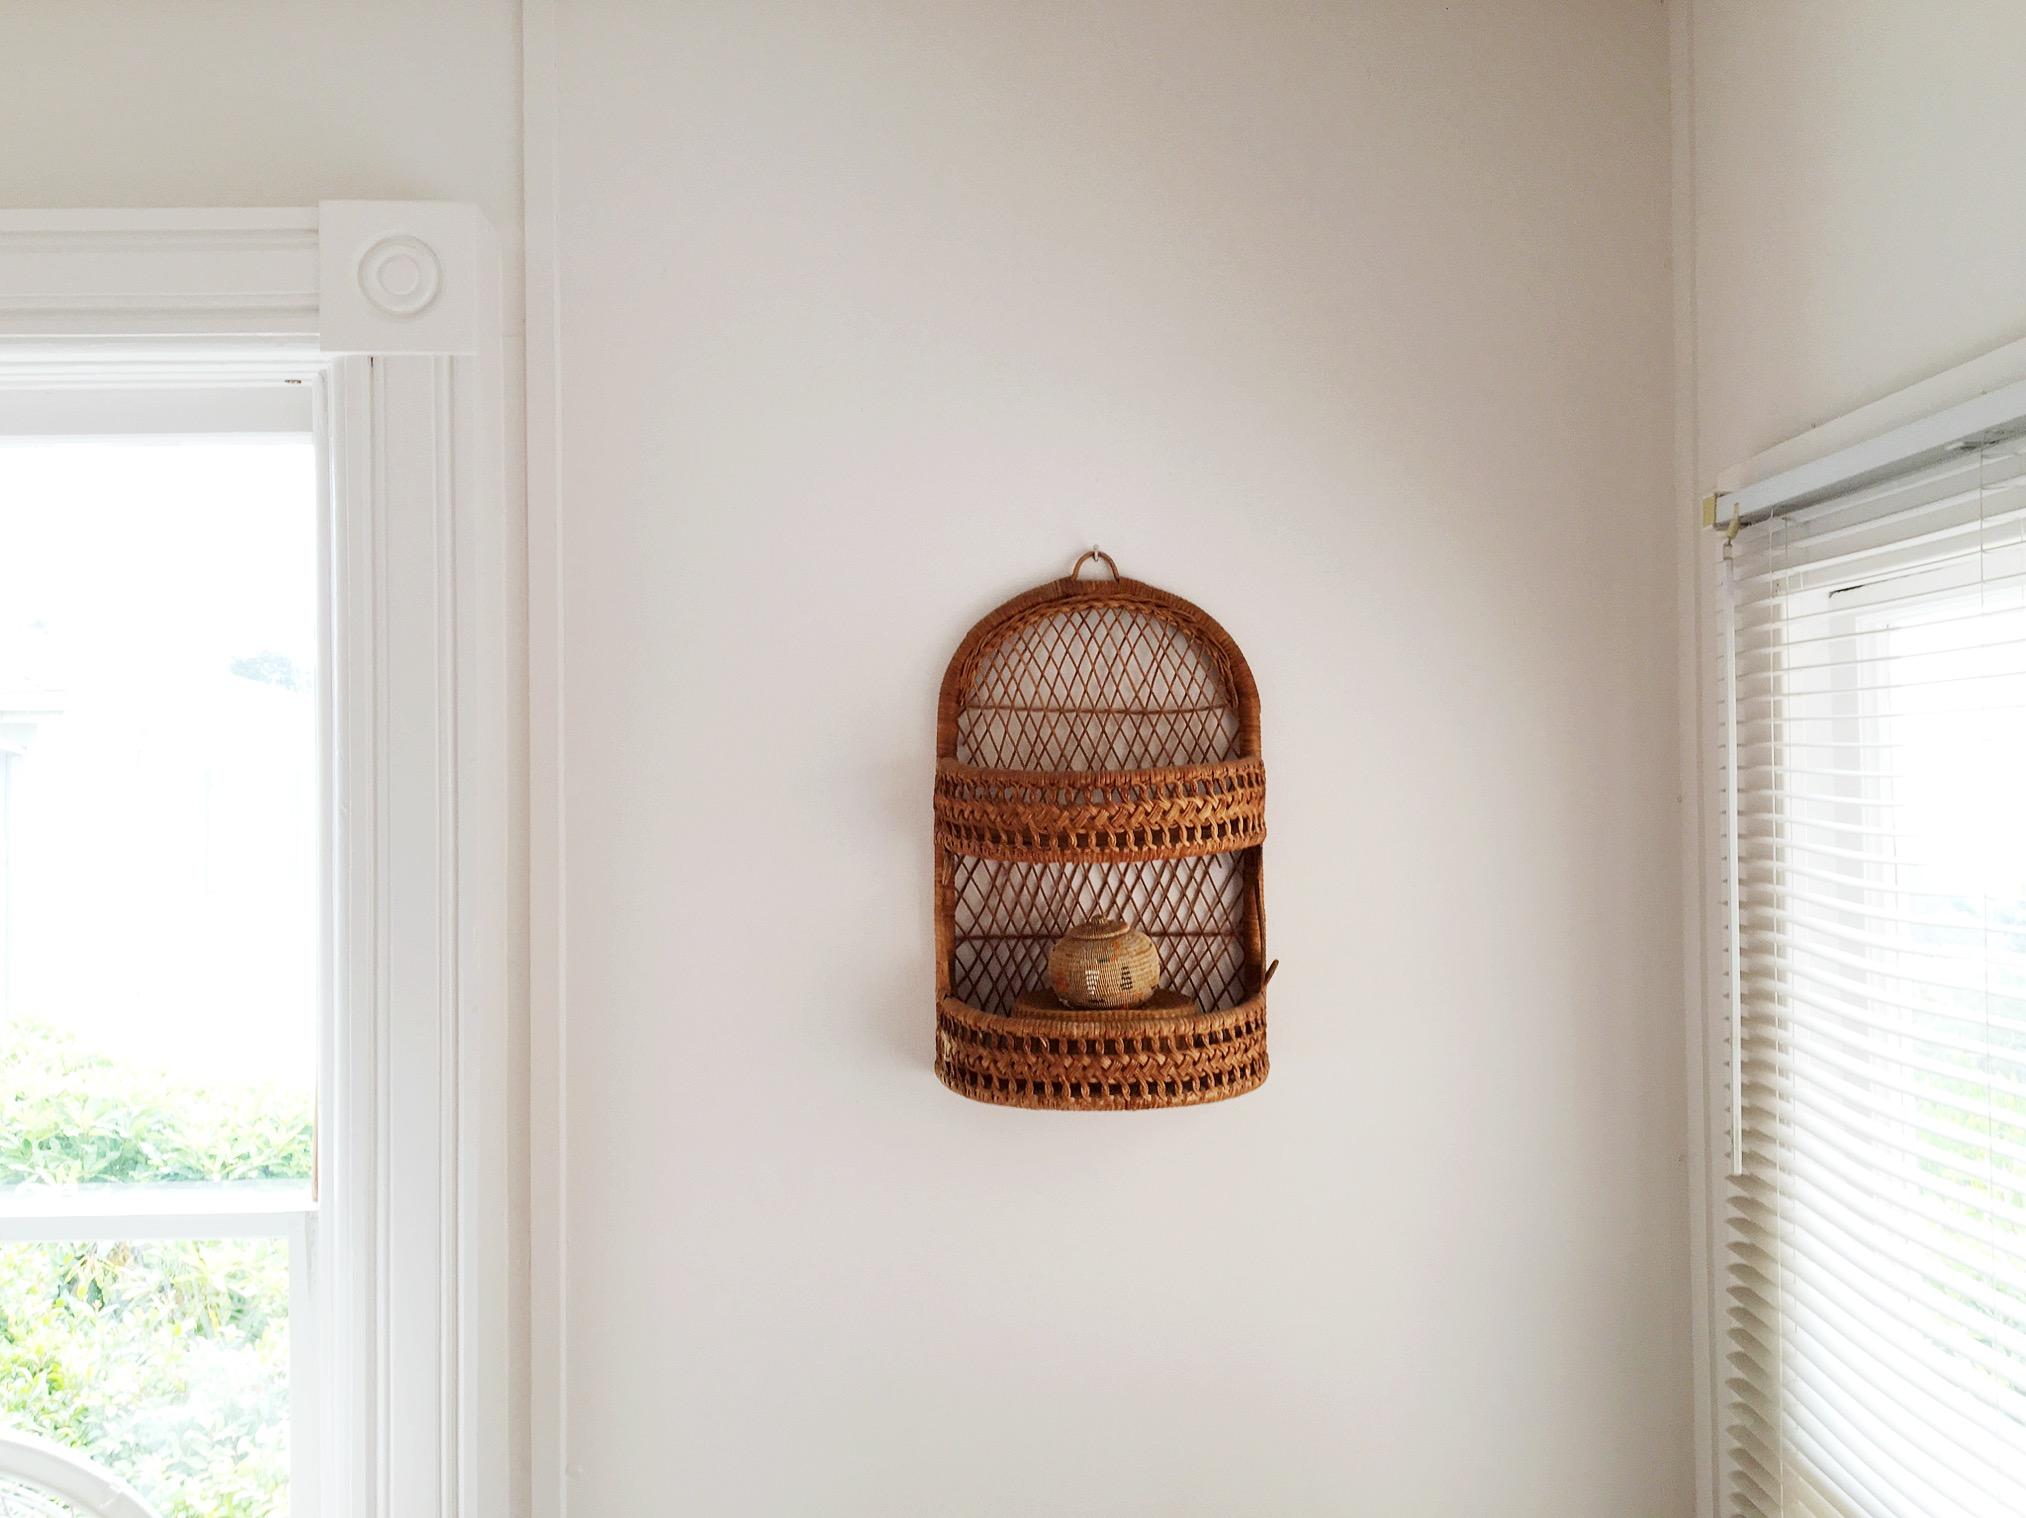 California Bohemian Minimal Basket on the wall